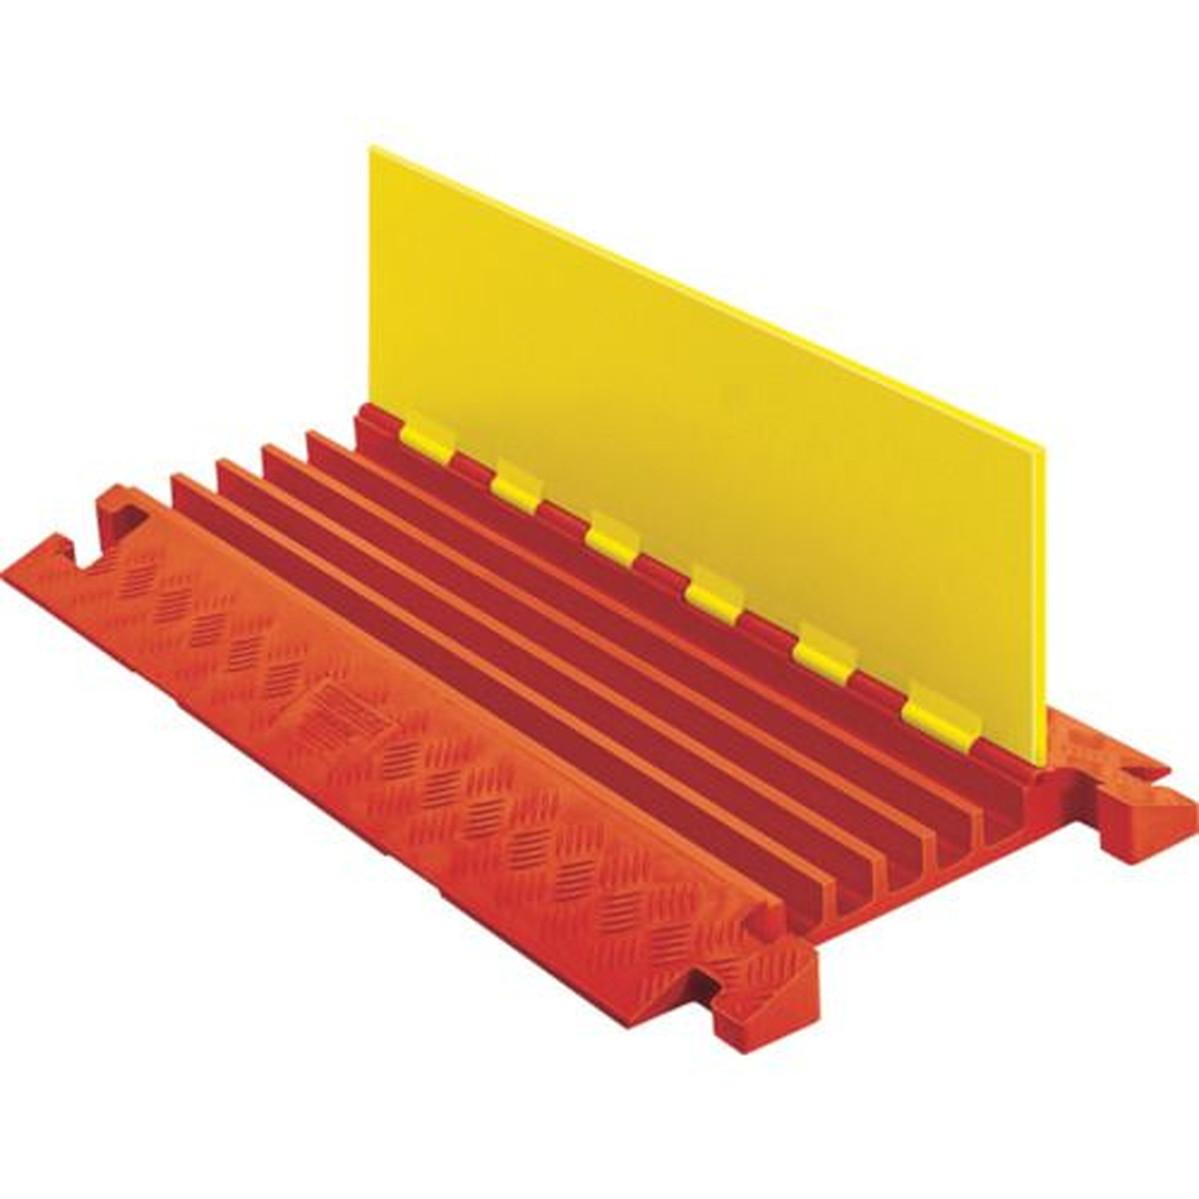 CHECKERS レール ラインバッカーケーブルプロテクタ 重量型電線5本用 1本 (CPRL-4/5-Y)